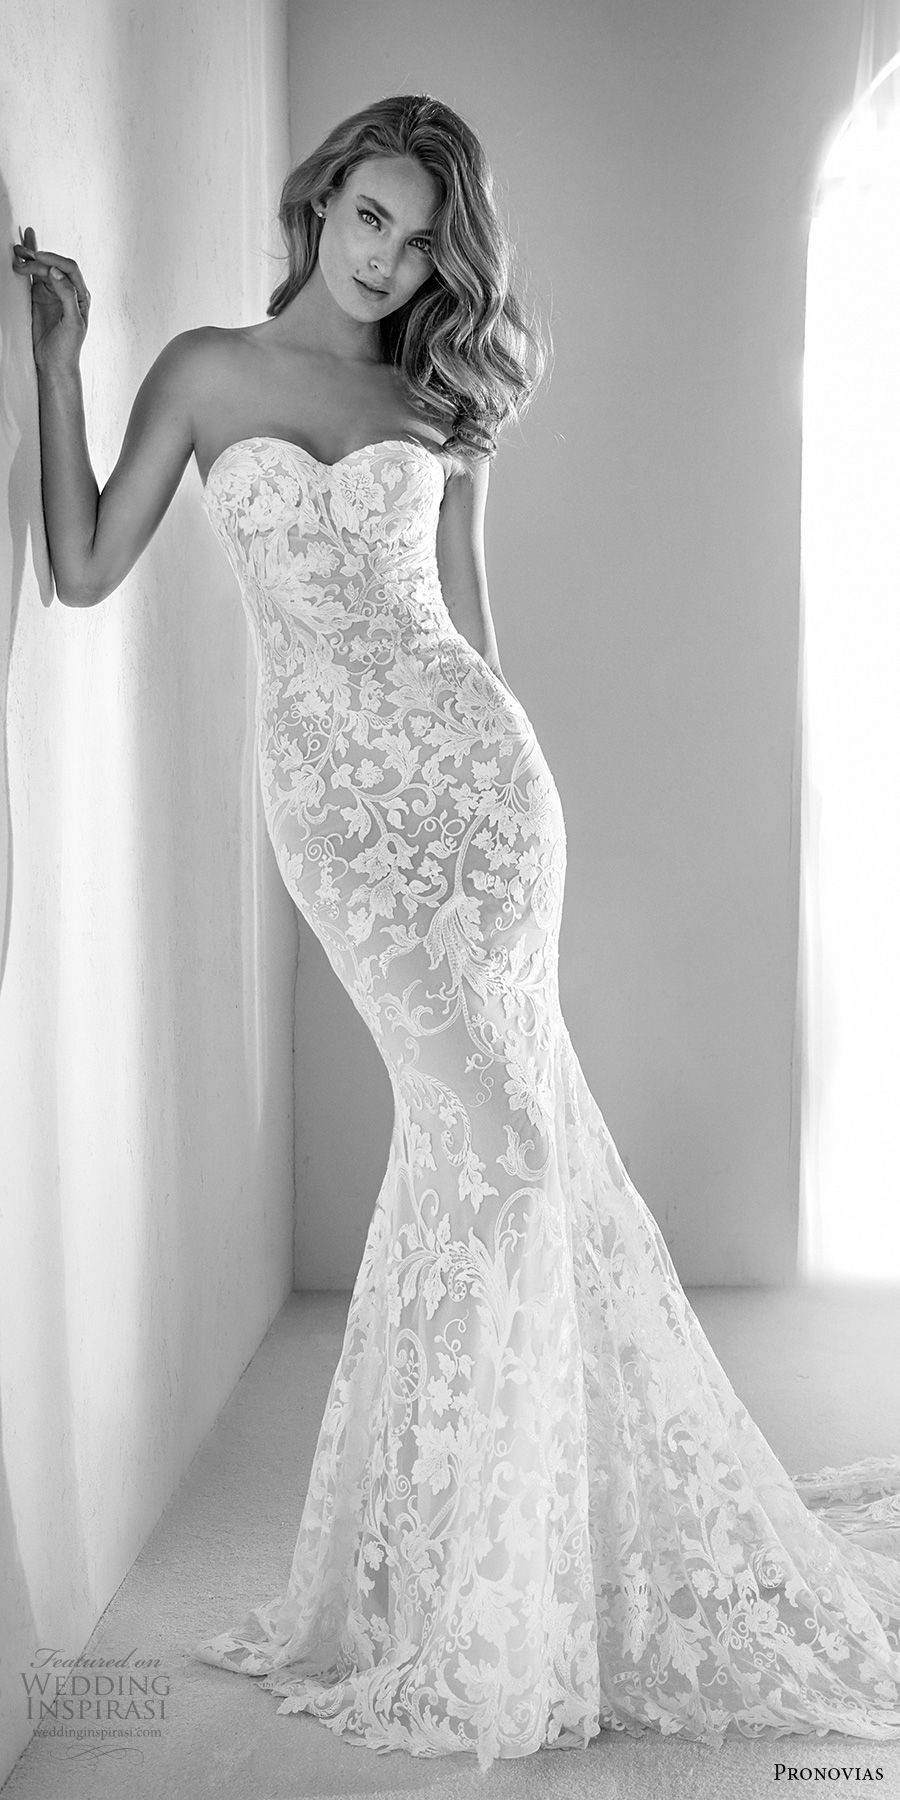 Danubio dentro Eclipse solar  Atelier Pronovias 2018 Wedding Dresses | Wedding Inspirasi